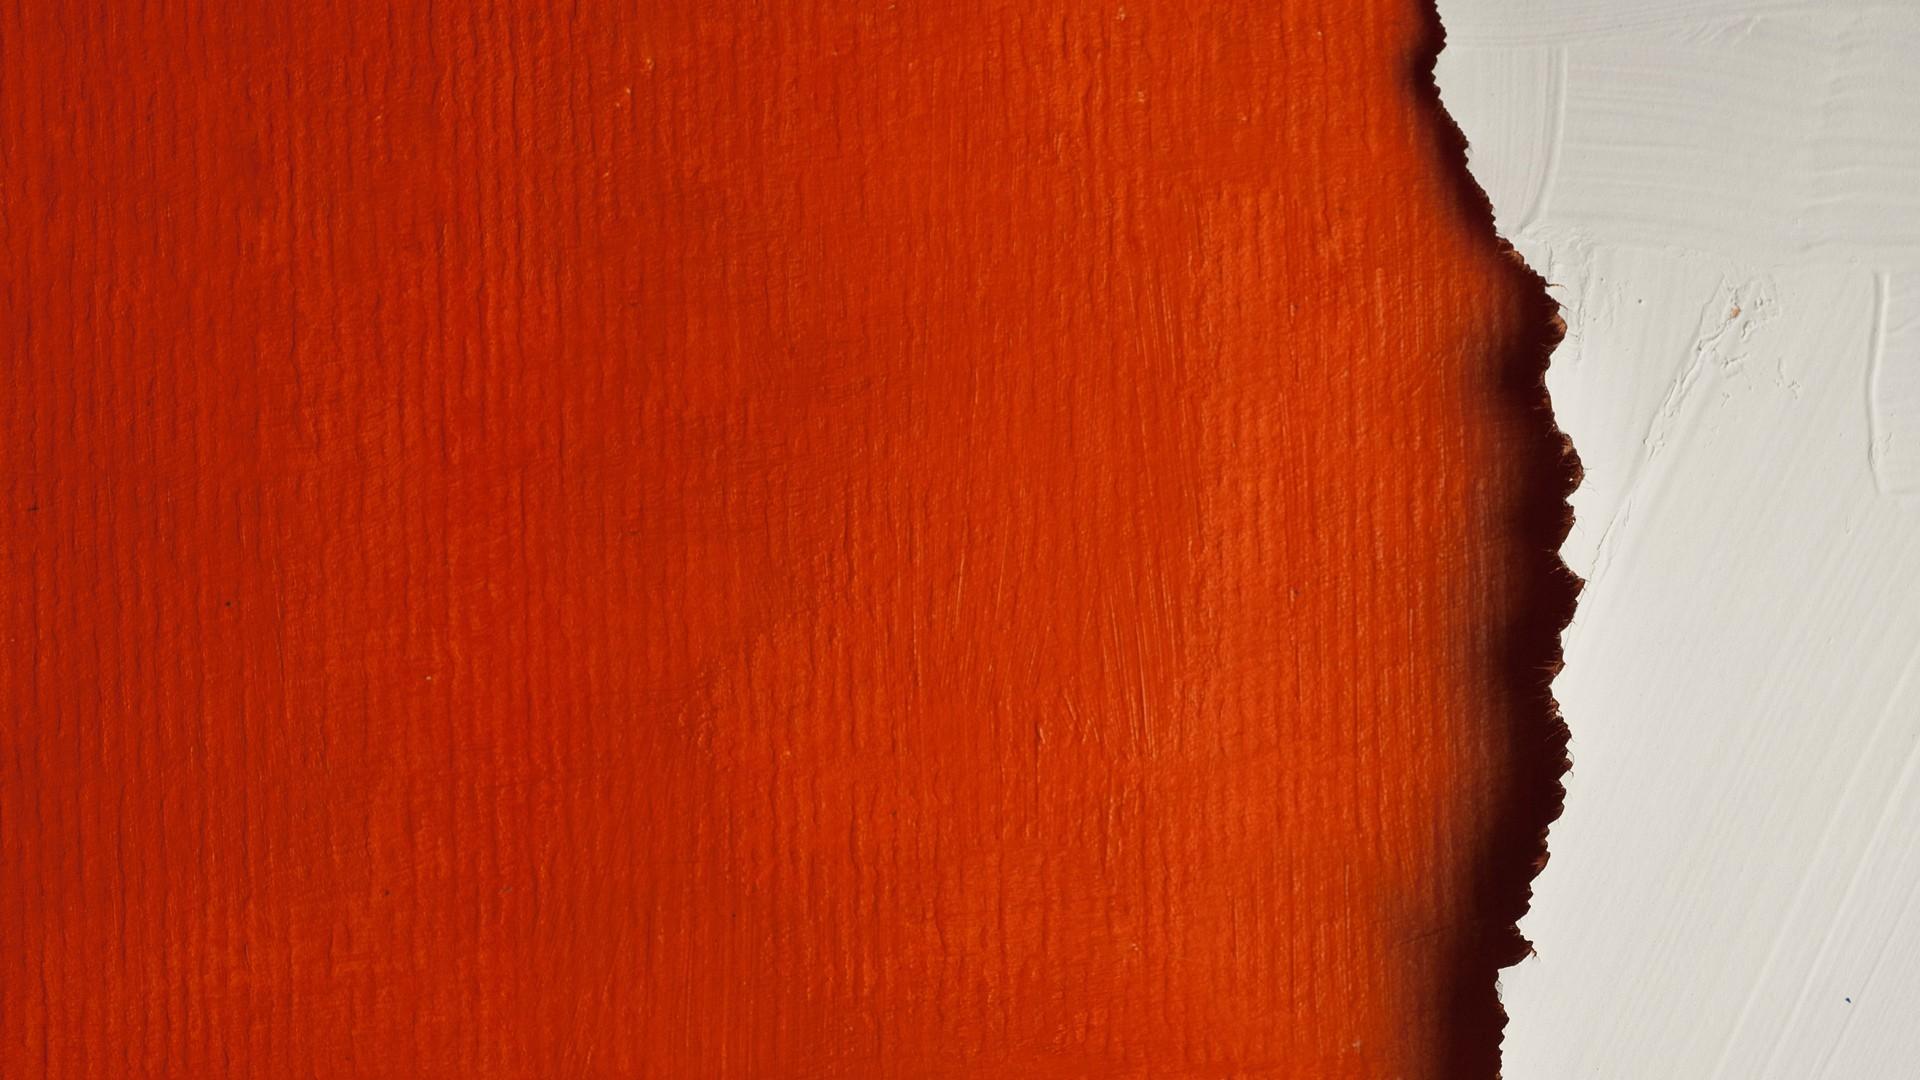 free Orange Textures wallpaper, resolution : 1920 x tags: Orange, Textures.